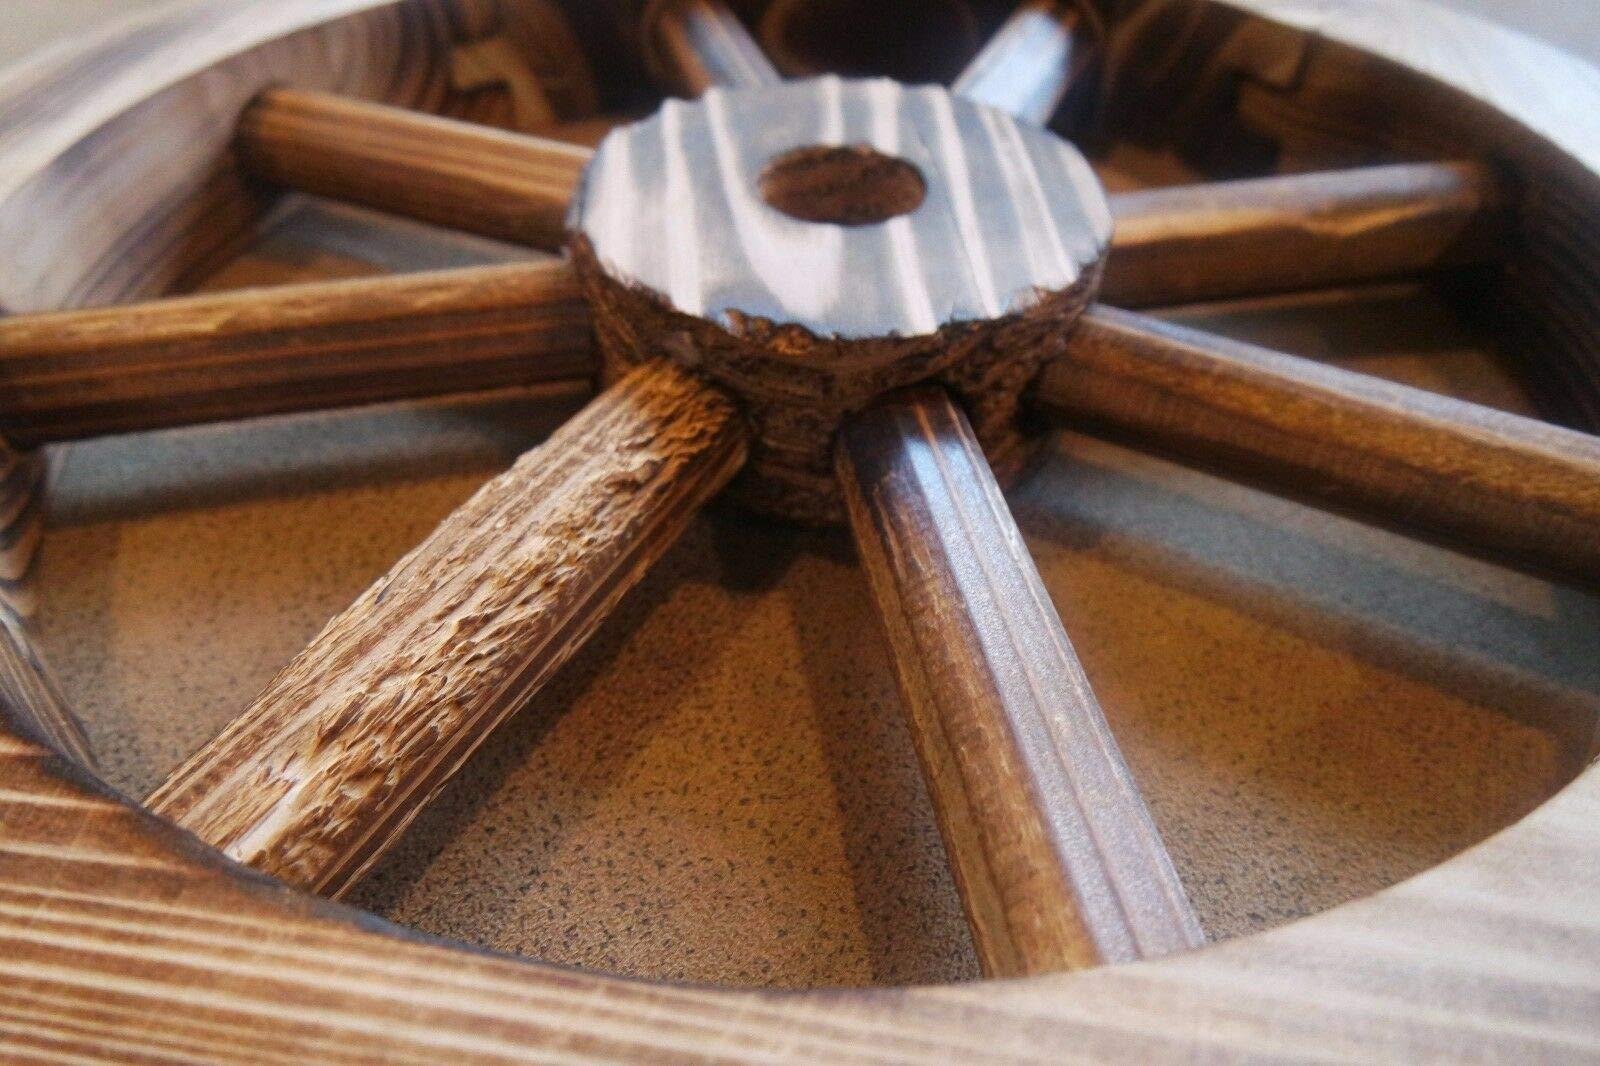 Galapagoz Wooden Wagon Wheels Burnt Wood Wheel Look Garden Decor Table Centerpiece Decorative 12'' 2 Pack US by Galapagoz (Image #4)